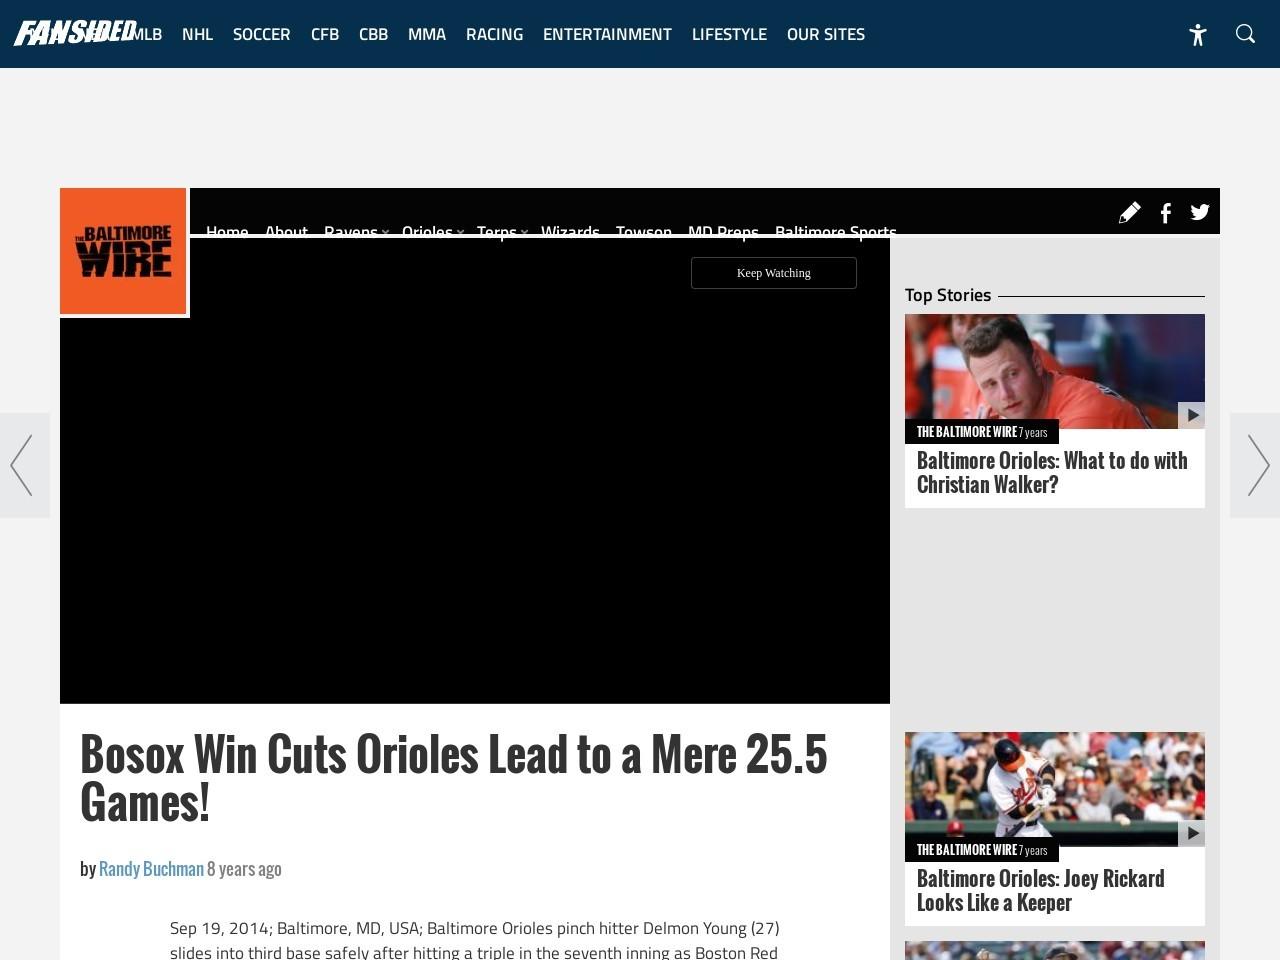 Bosox Win Cuts Orioles Lead to a Mere 25.5 Games!